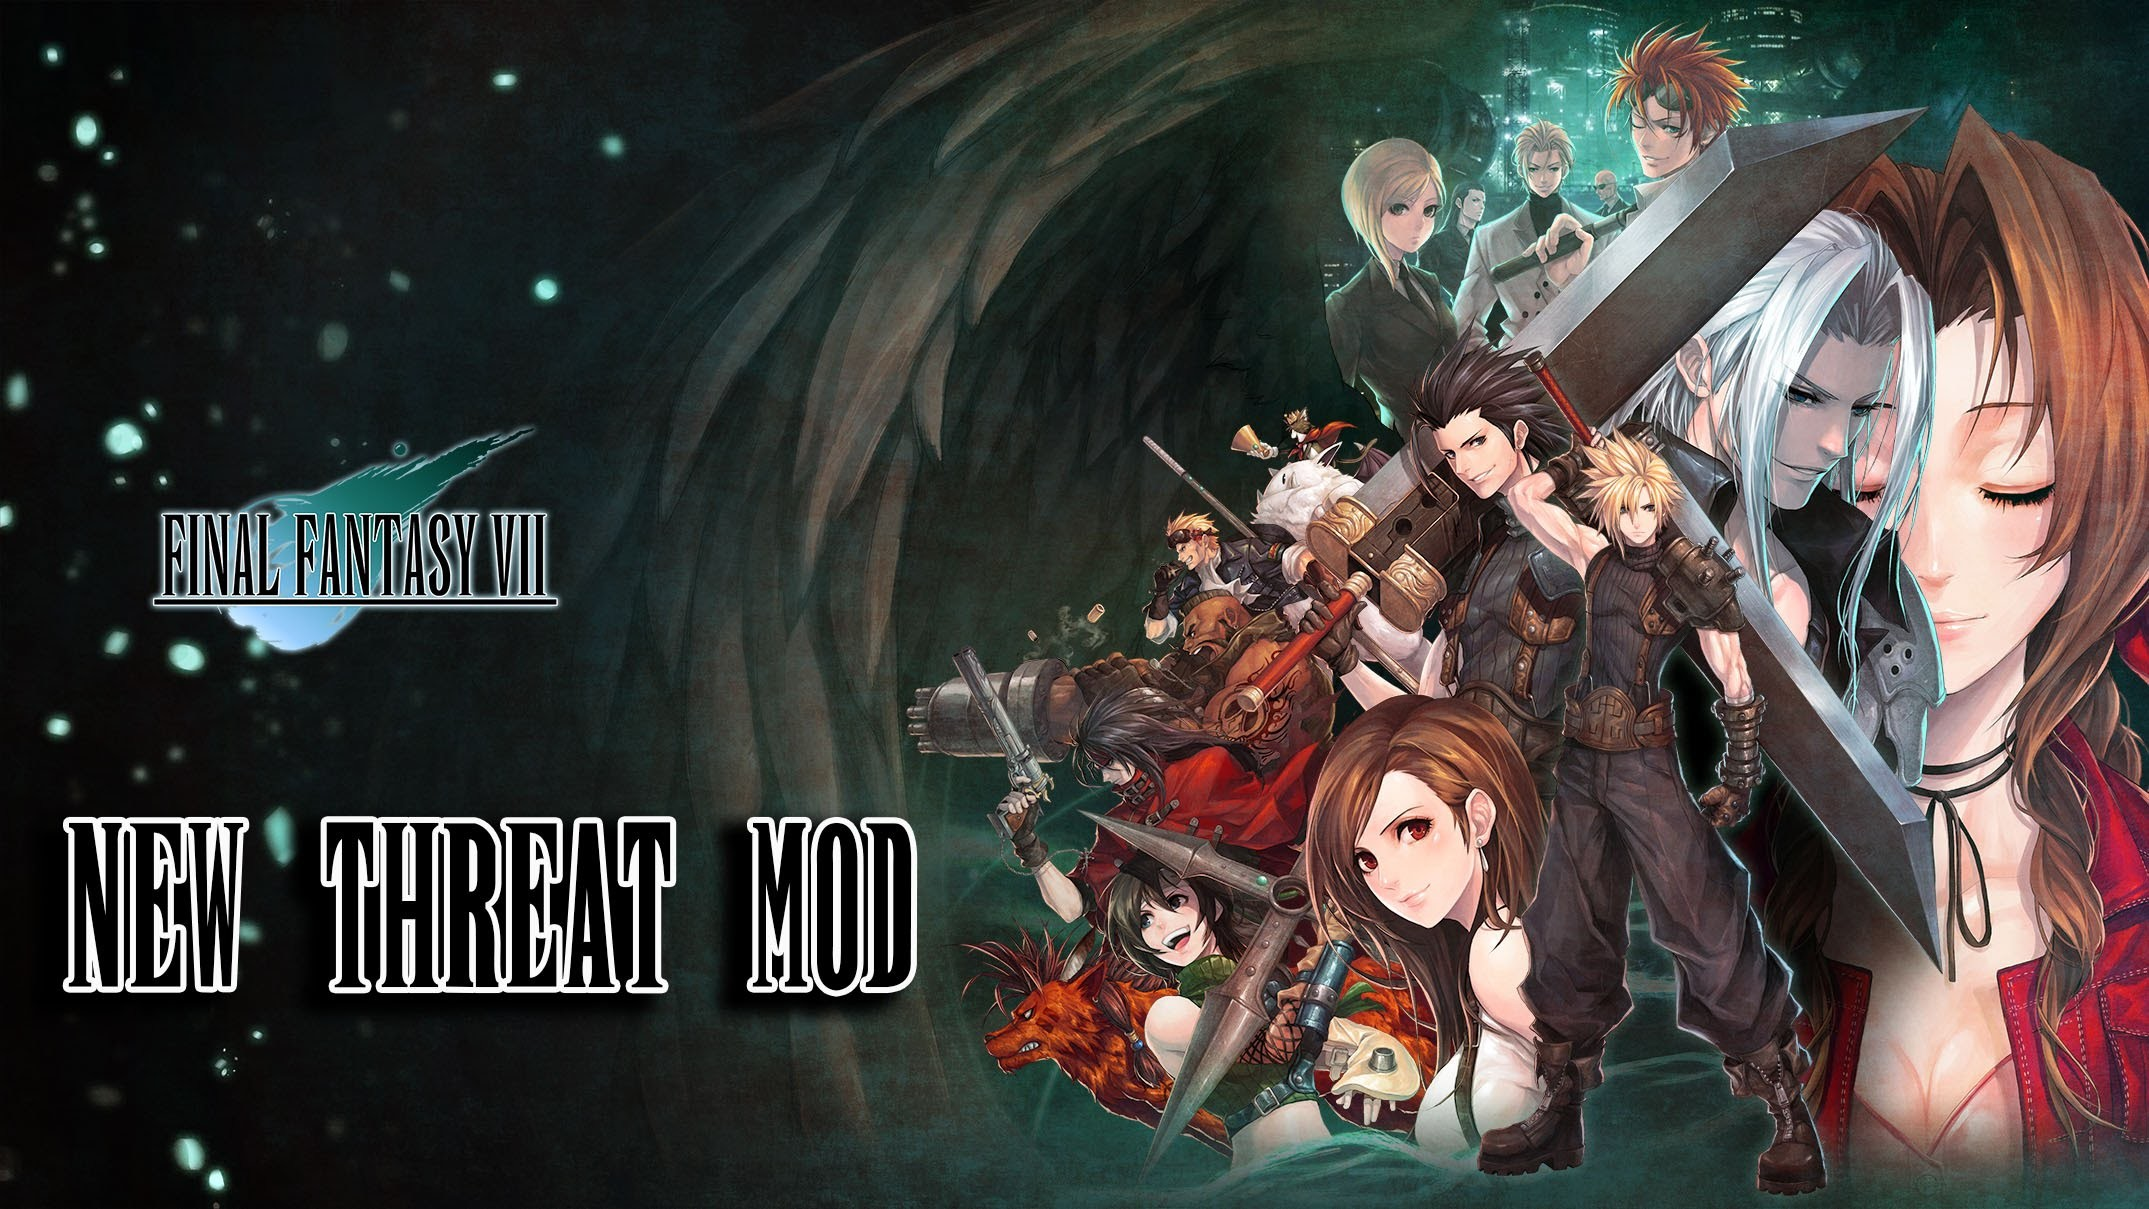 Final Fantasy VII New Threat mod – YouTube